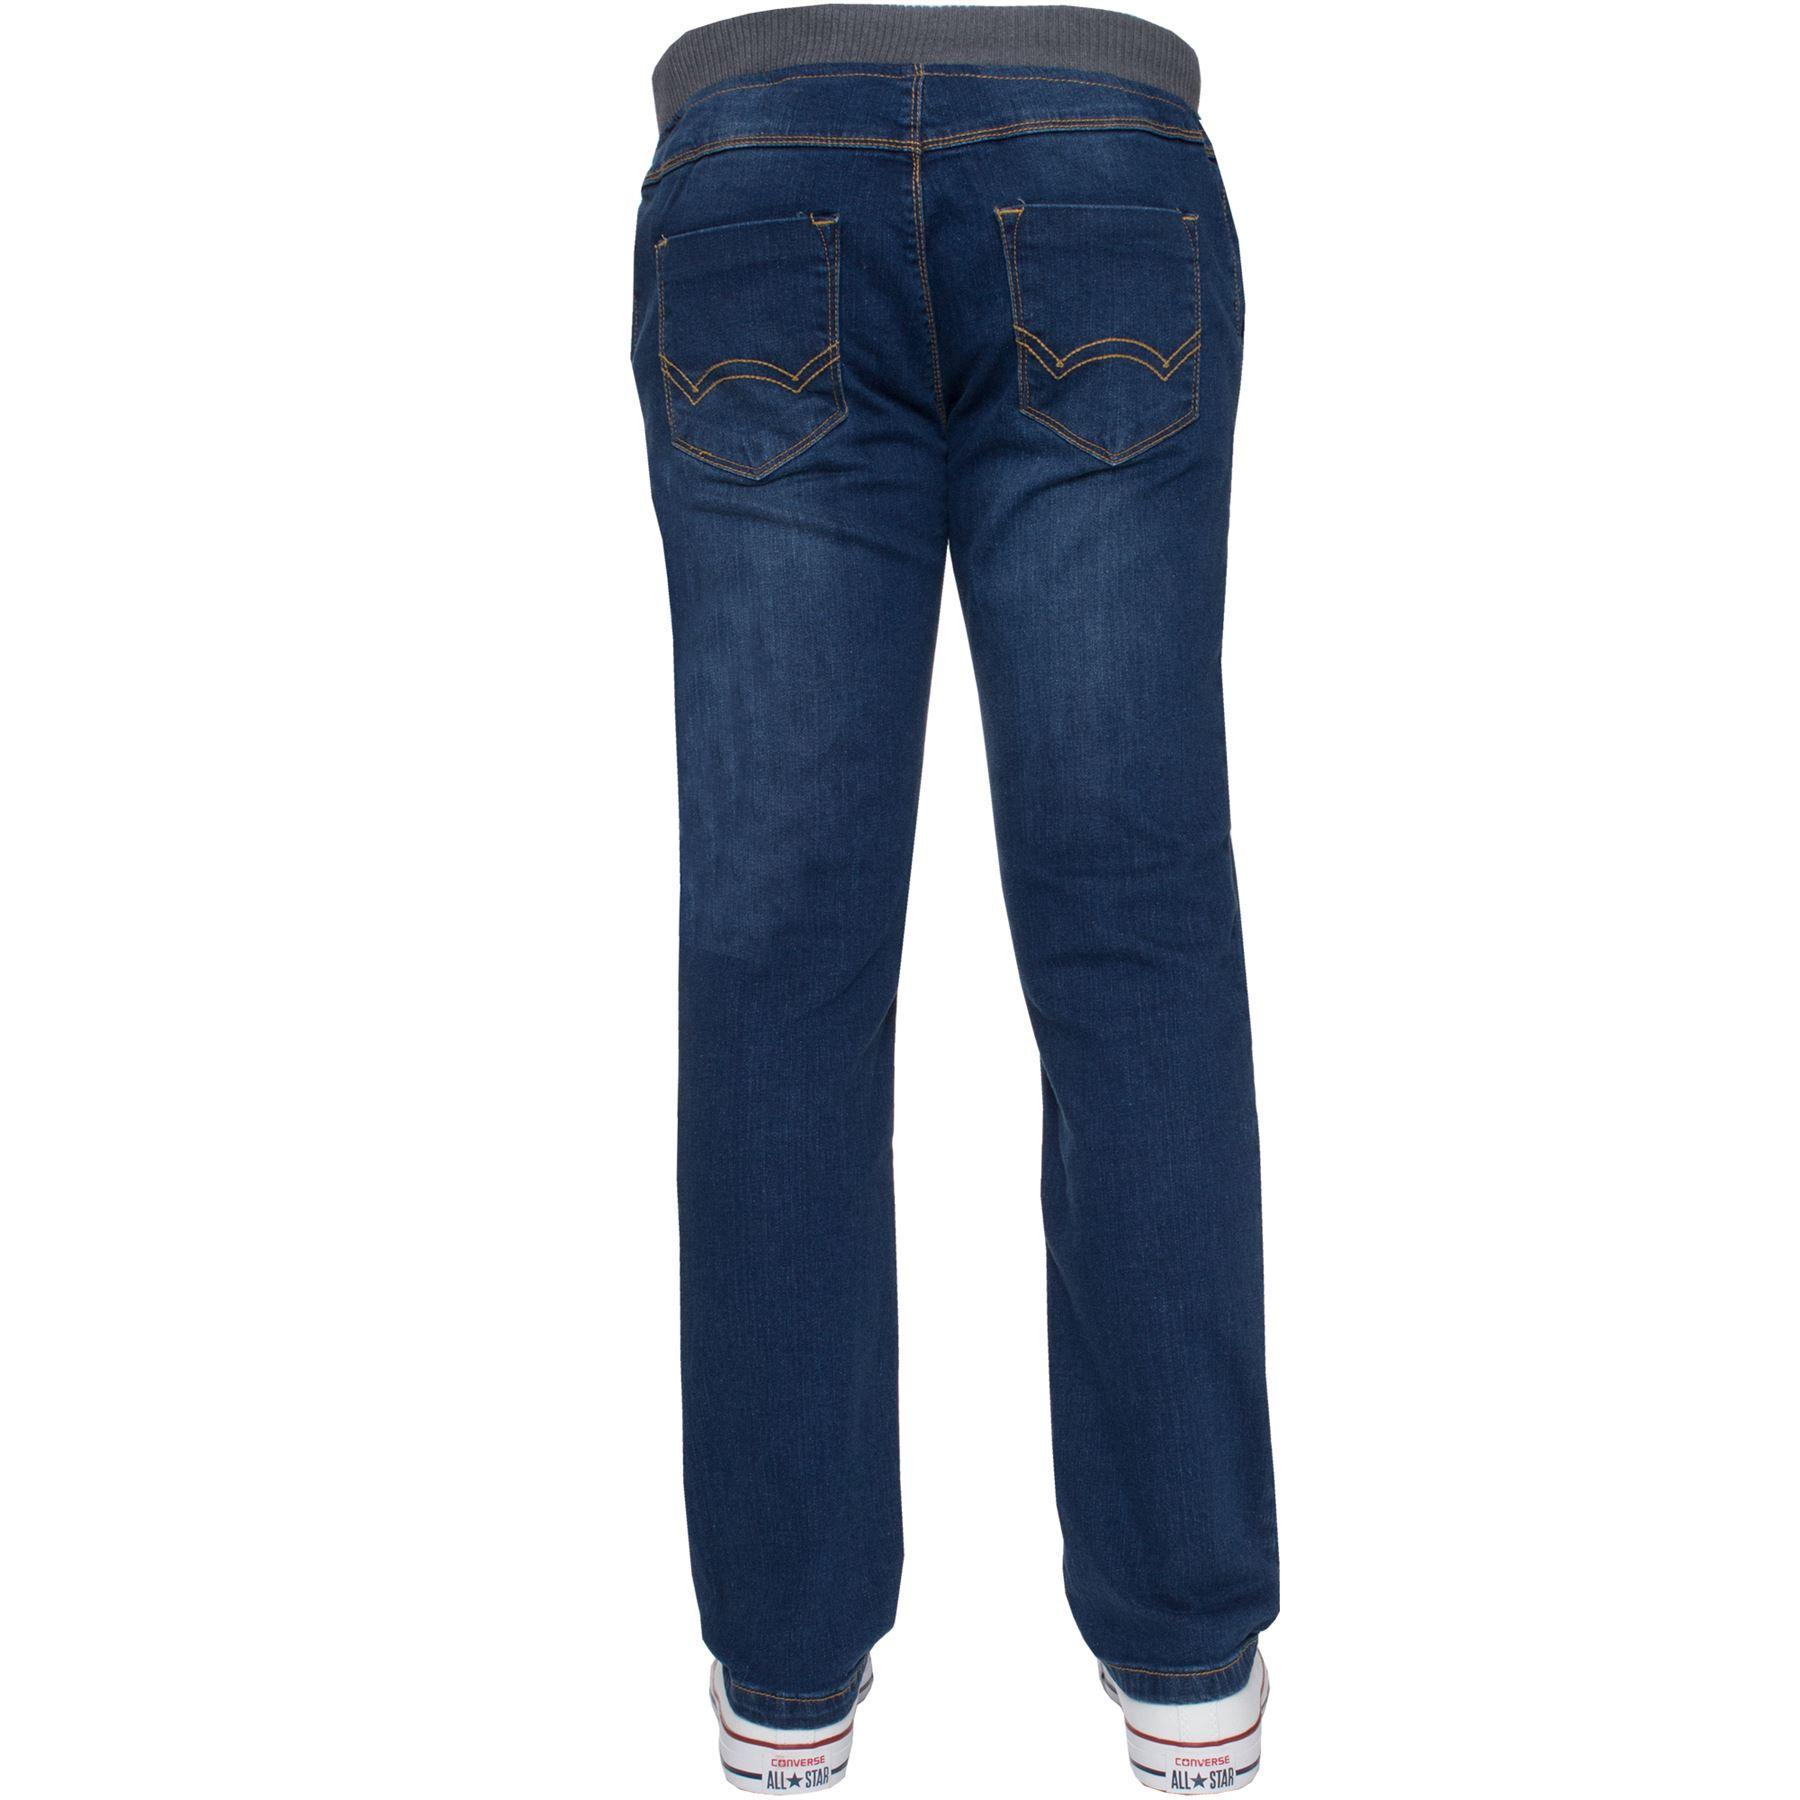 Jean-Garcon-Taille-Elastique-Enfants-Skinny-Stretch-School-Denim-Pantalon-Pantalon miniature 11